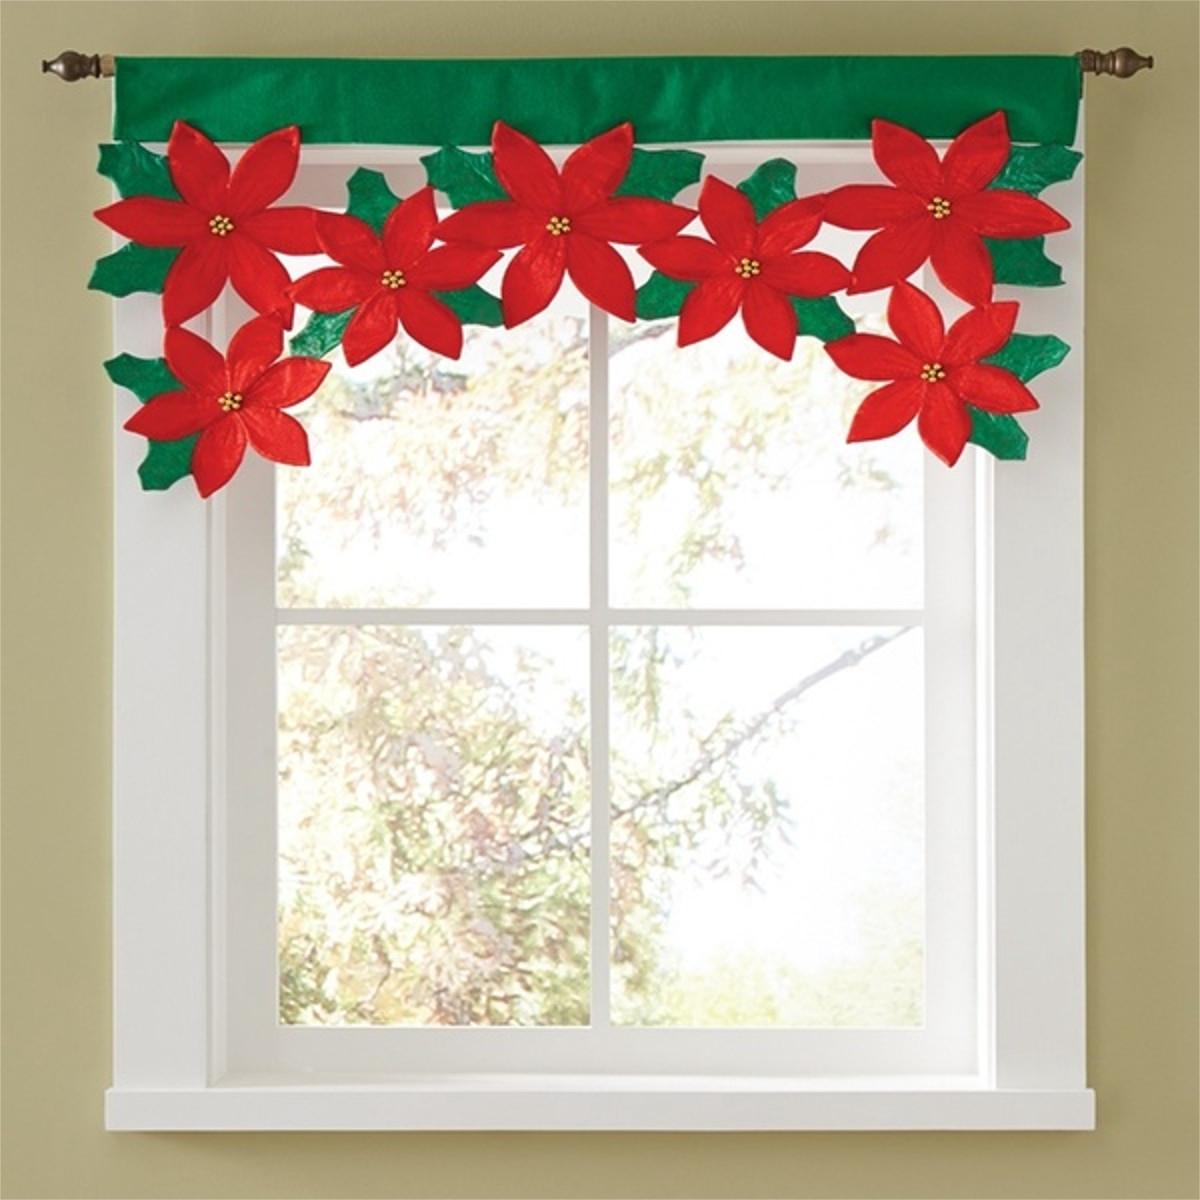 Christmas Petals Curtains Festival Xmas Flower Curtain Living Room Decoration